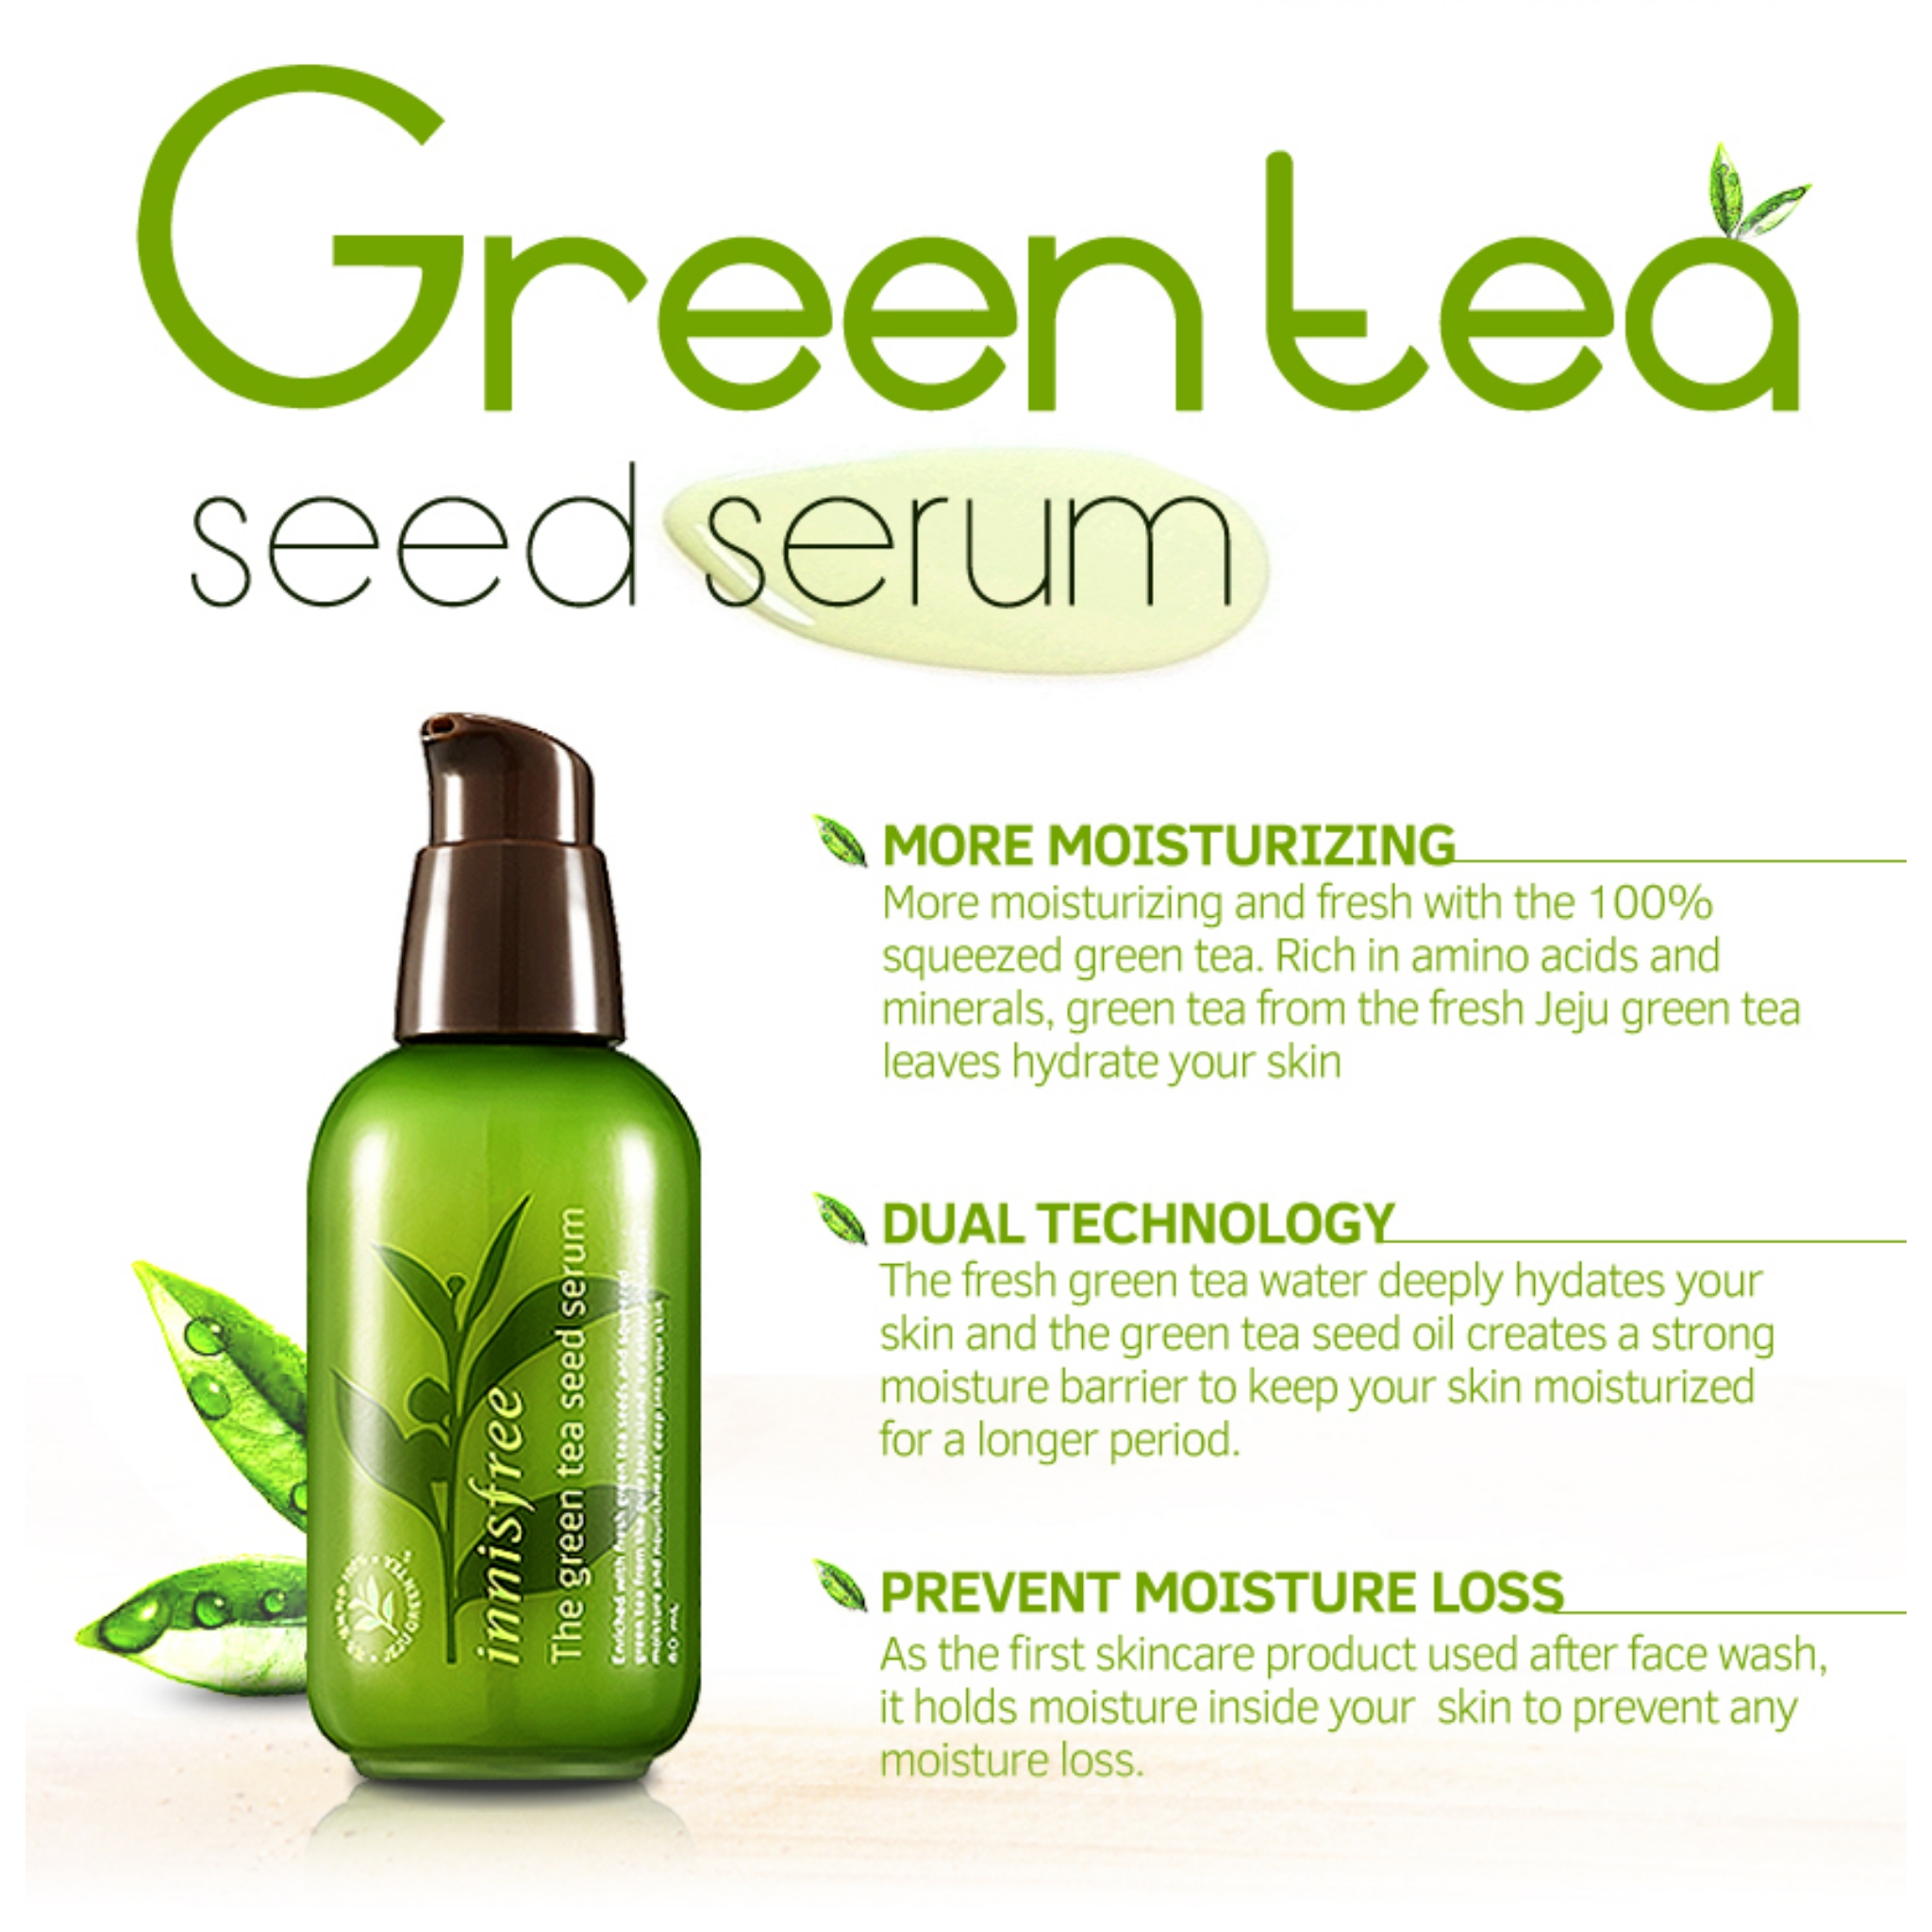 Innisfree Green Tea Seed Serum 80 Ml Eye Cream 171217204743 Img 20170815 103604 01 1506134518484 1506134541053